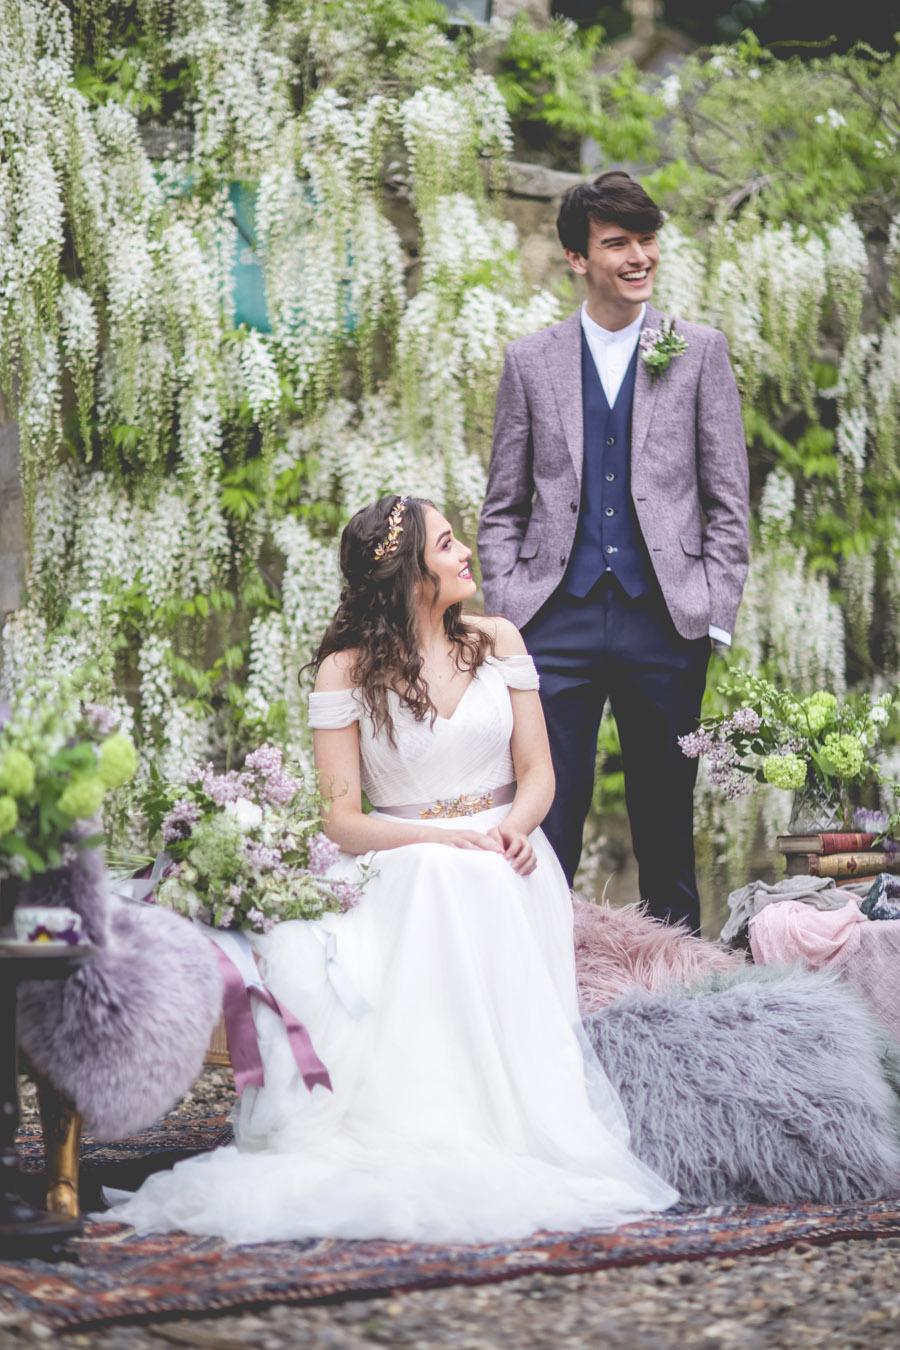 Eshott Hall wedding inspiration, credit Sean Elliott Photography (6)